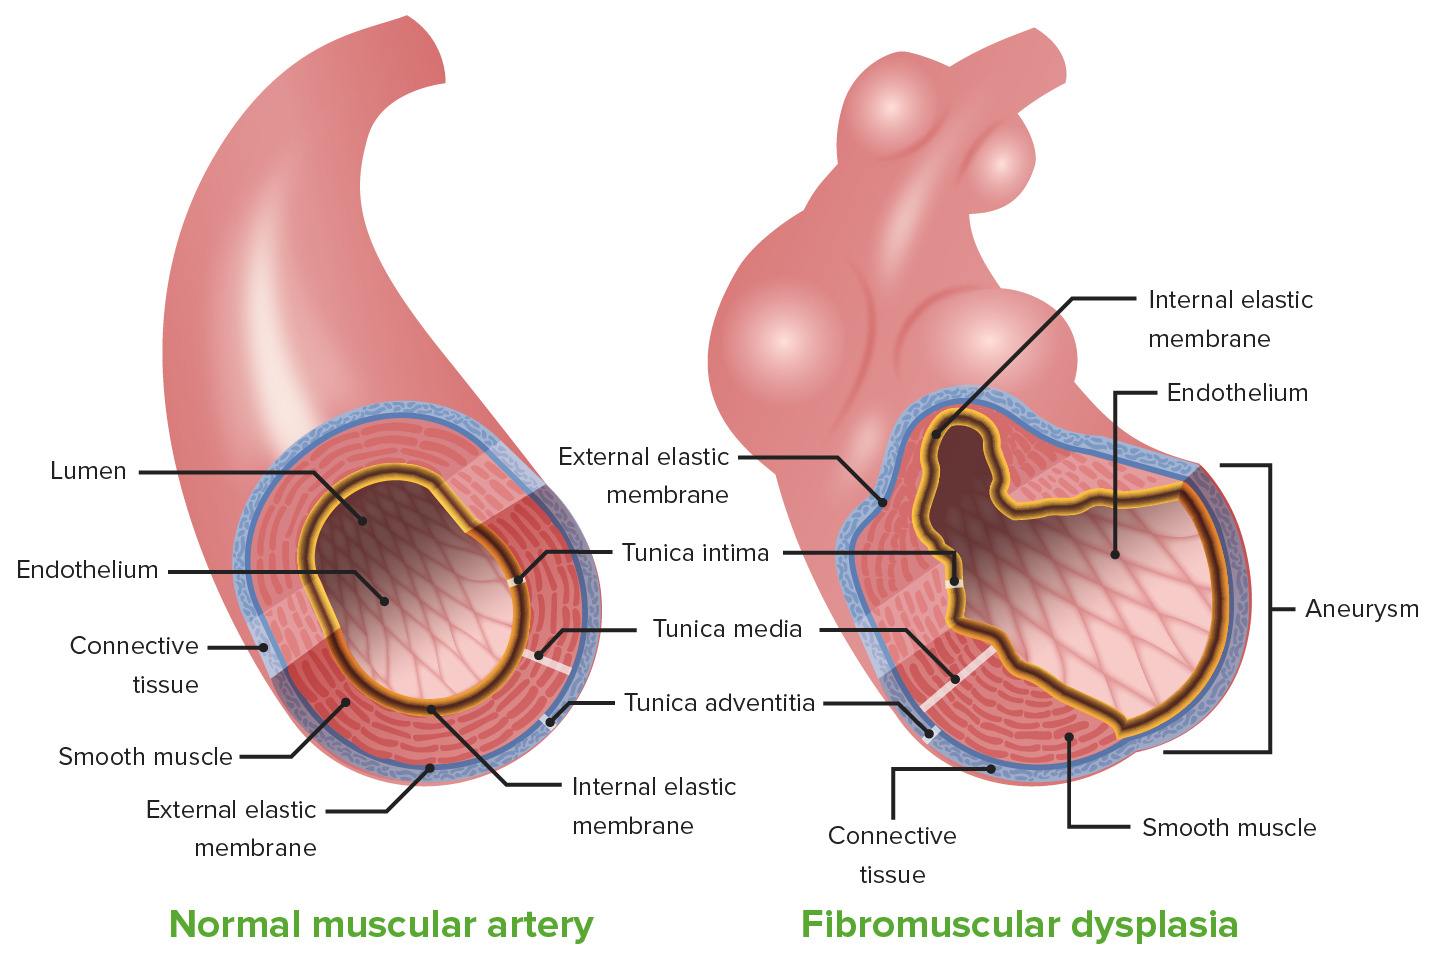 Fibromuscular dysplasia